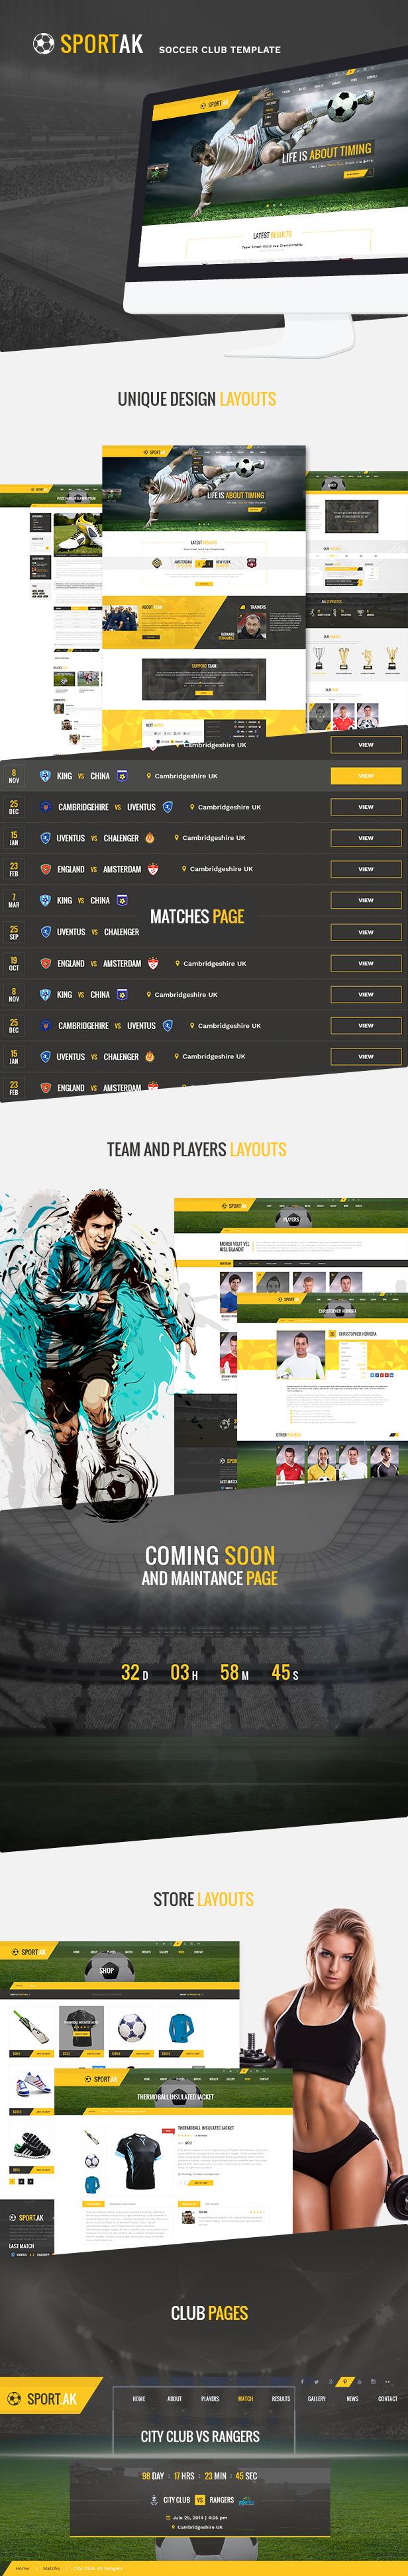 WordPress Sports Theme - SportAK - 1